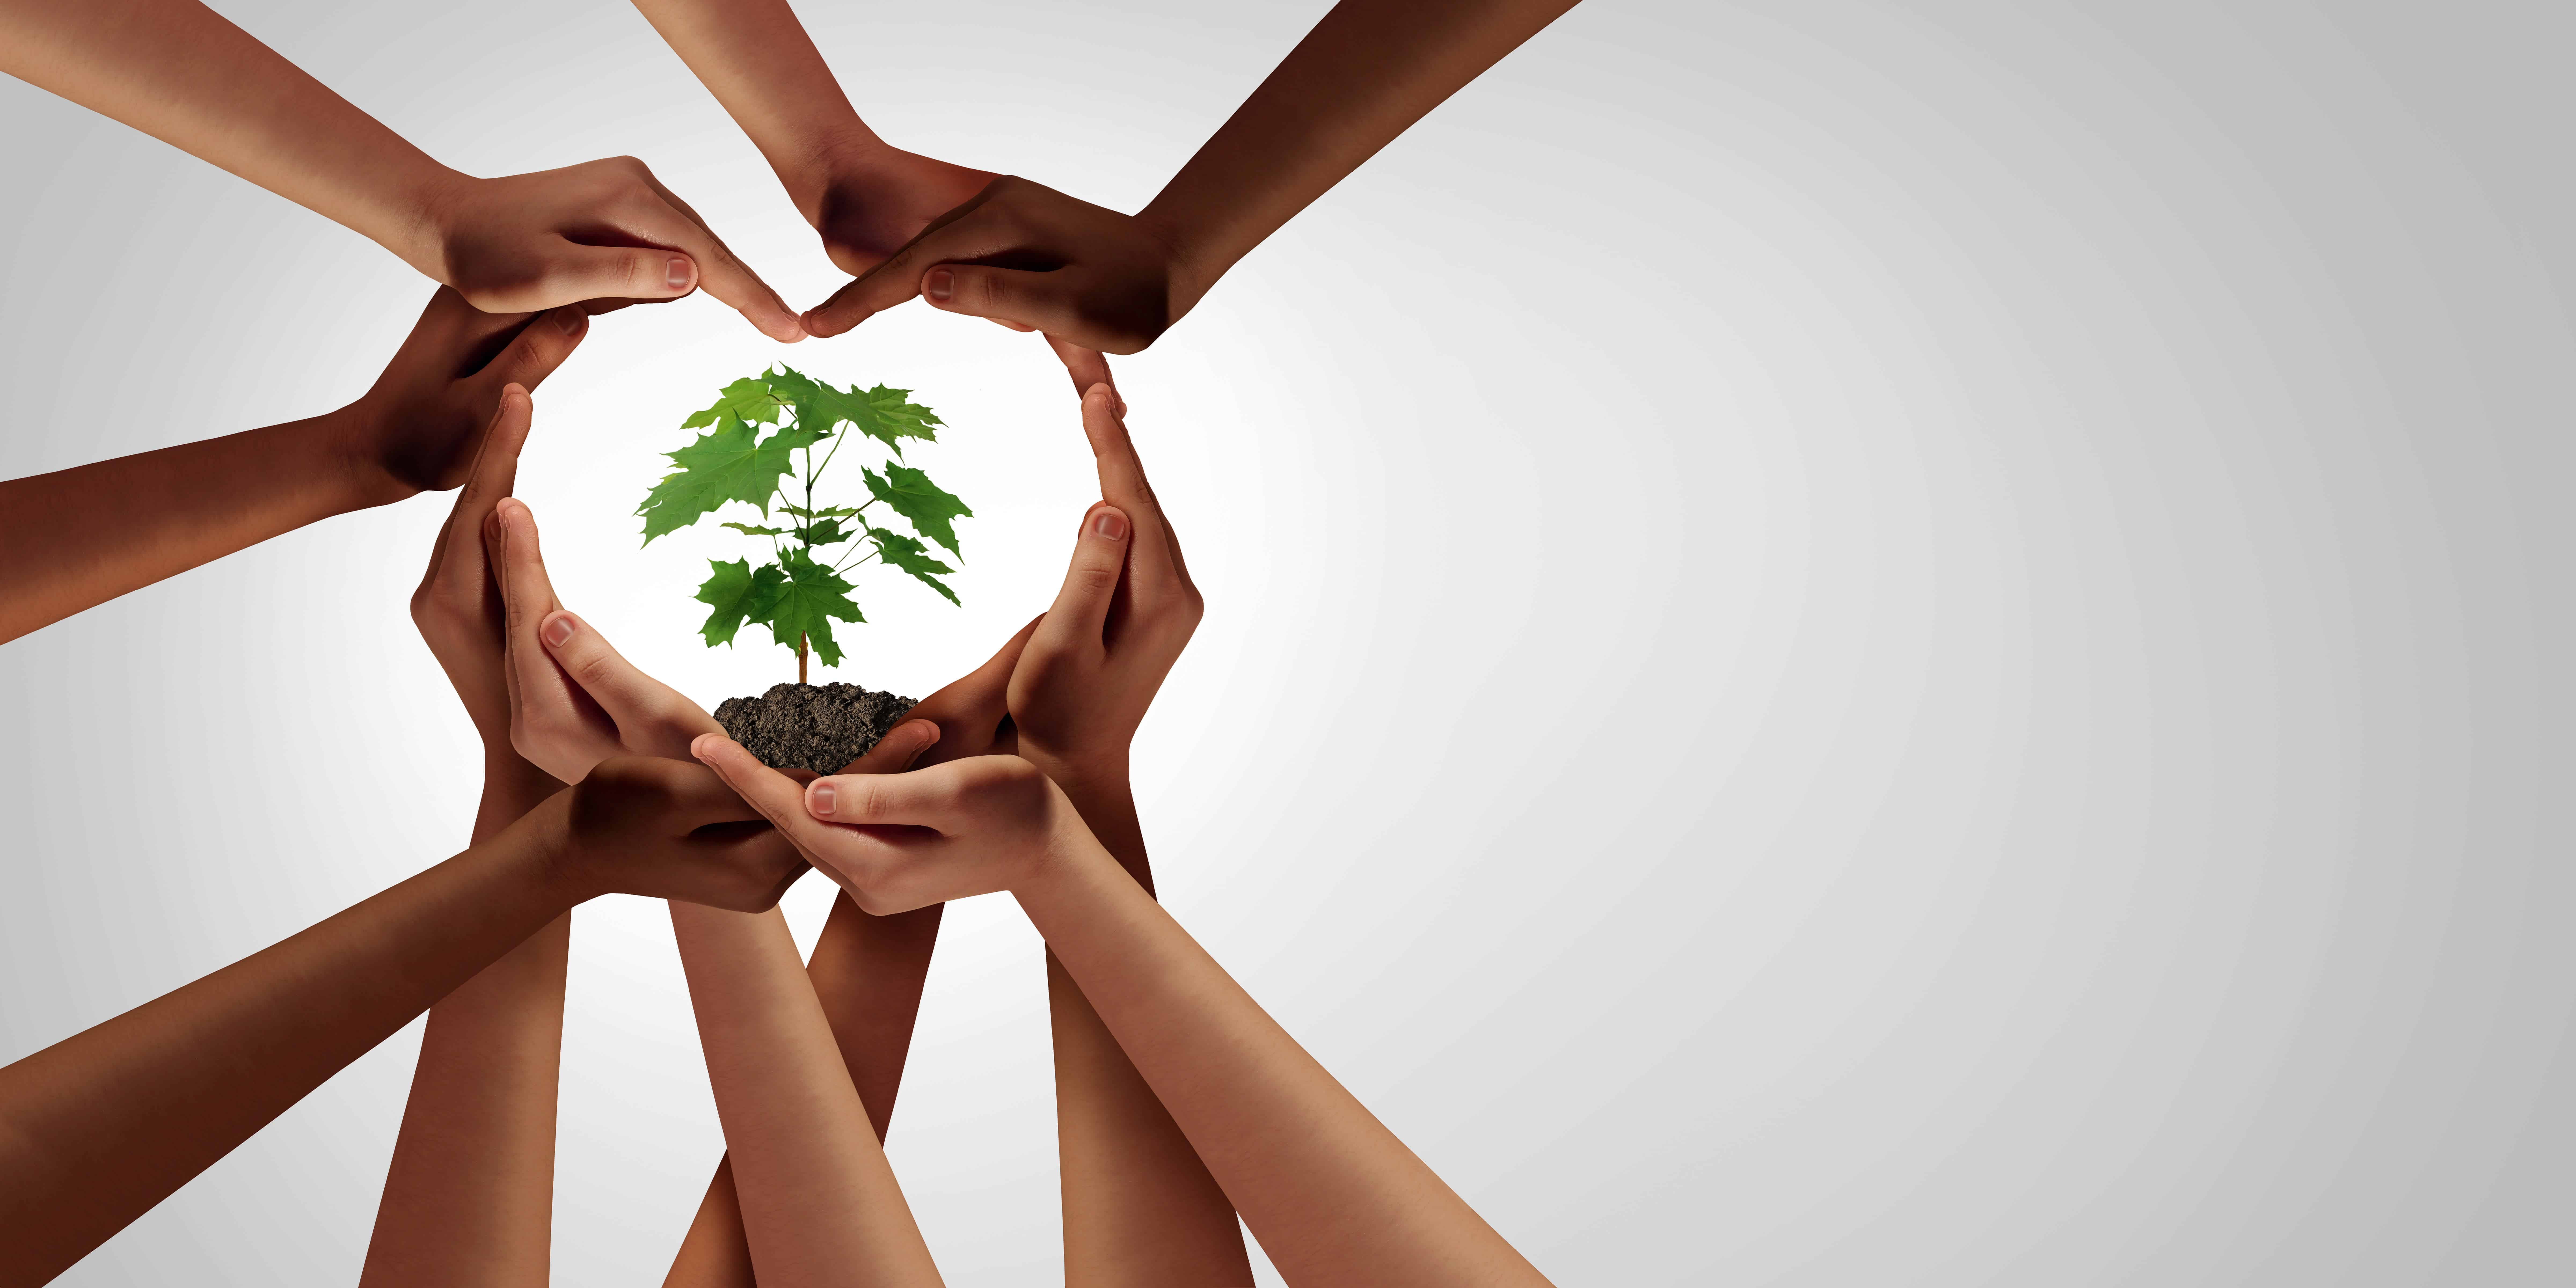 environmentally friendly, tree, save the planet